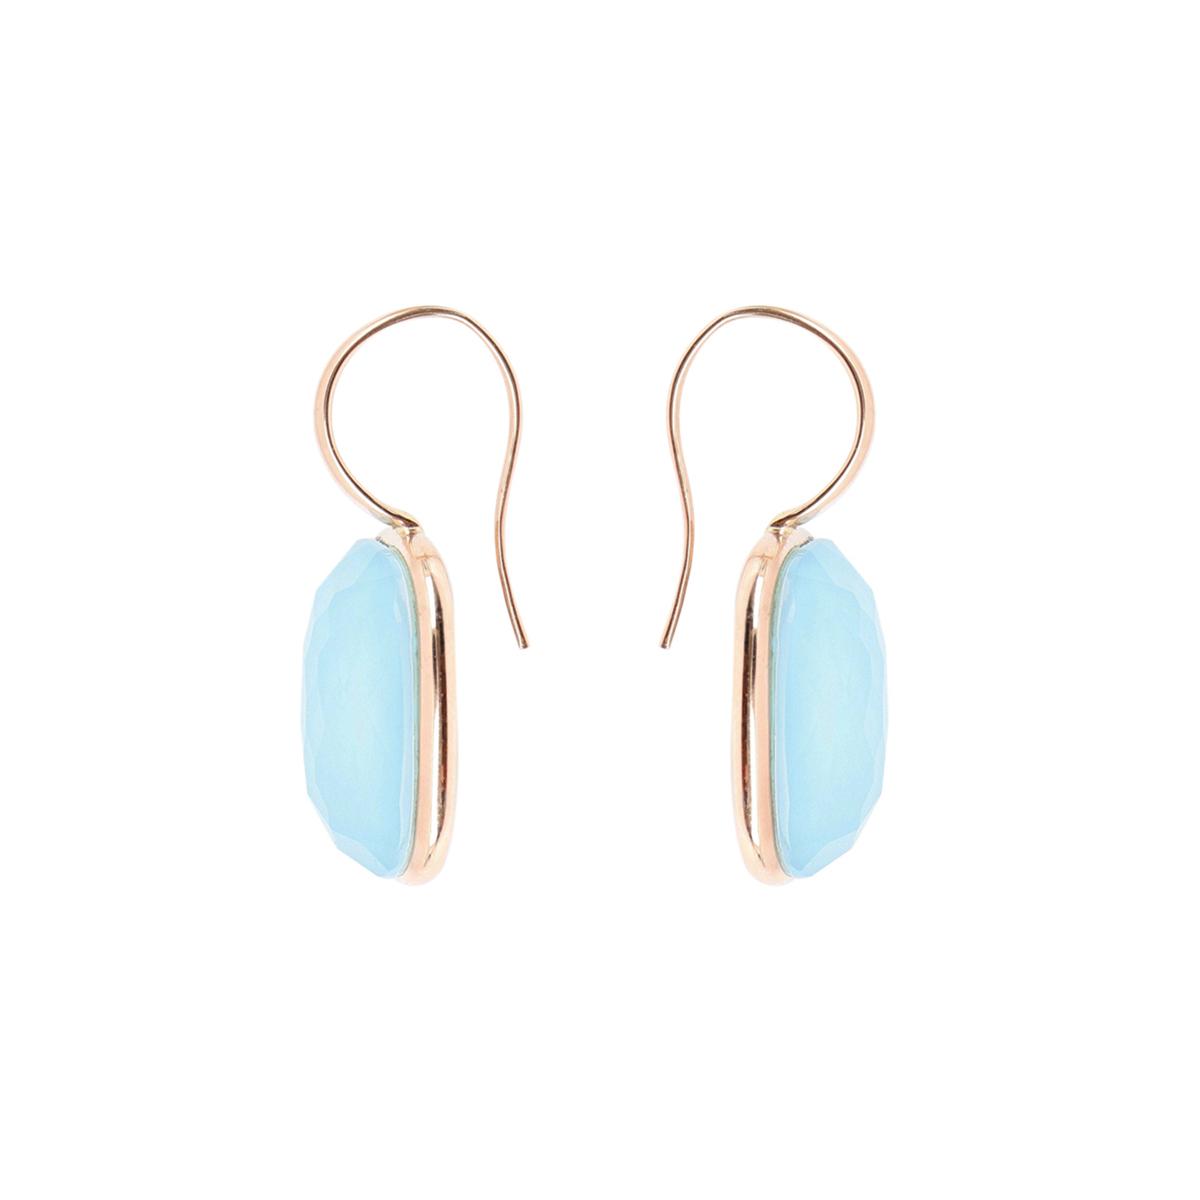 Multiple Facet Cut Quartz And Turquoise Earrings